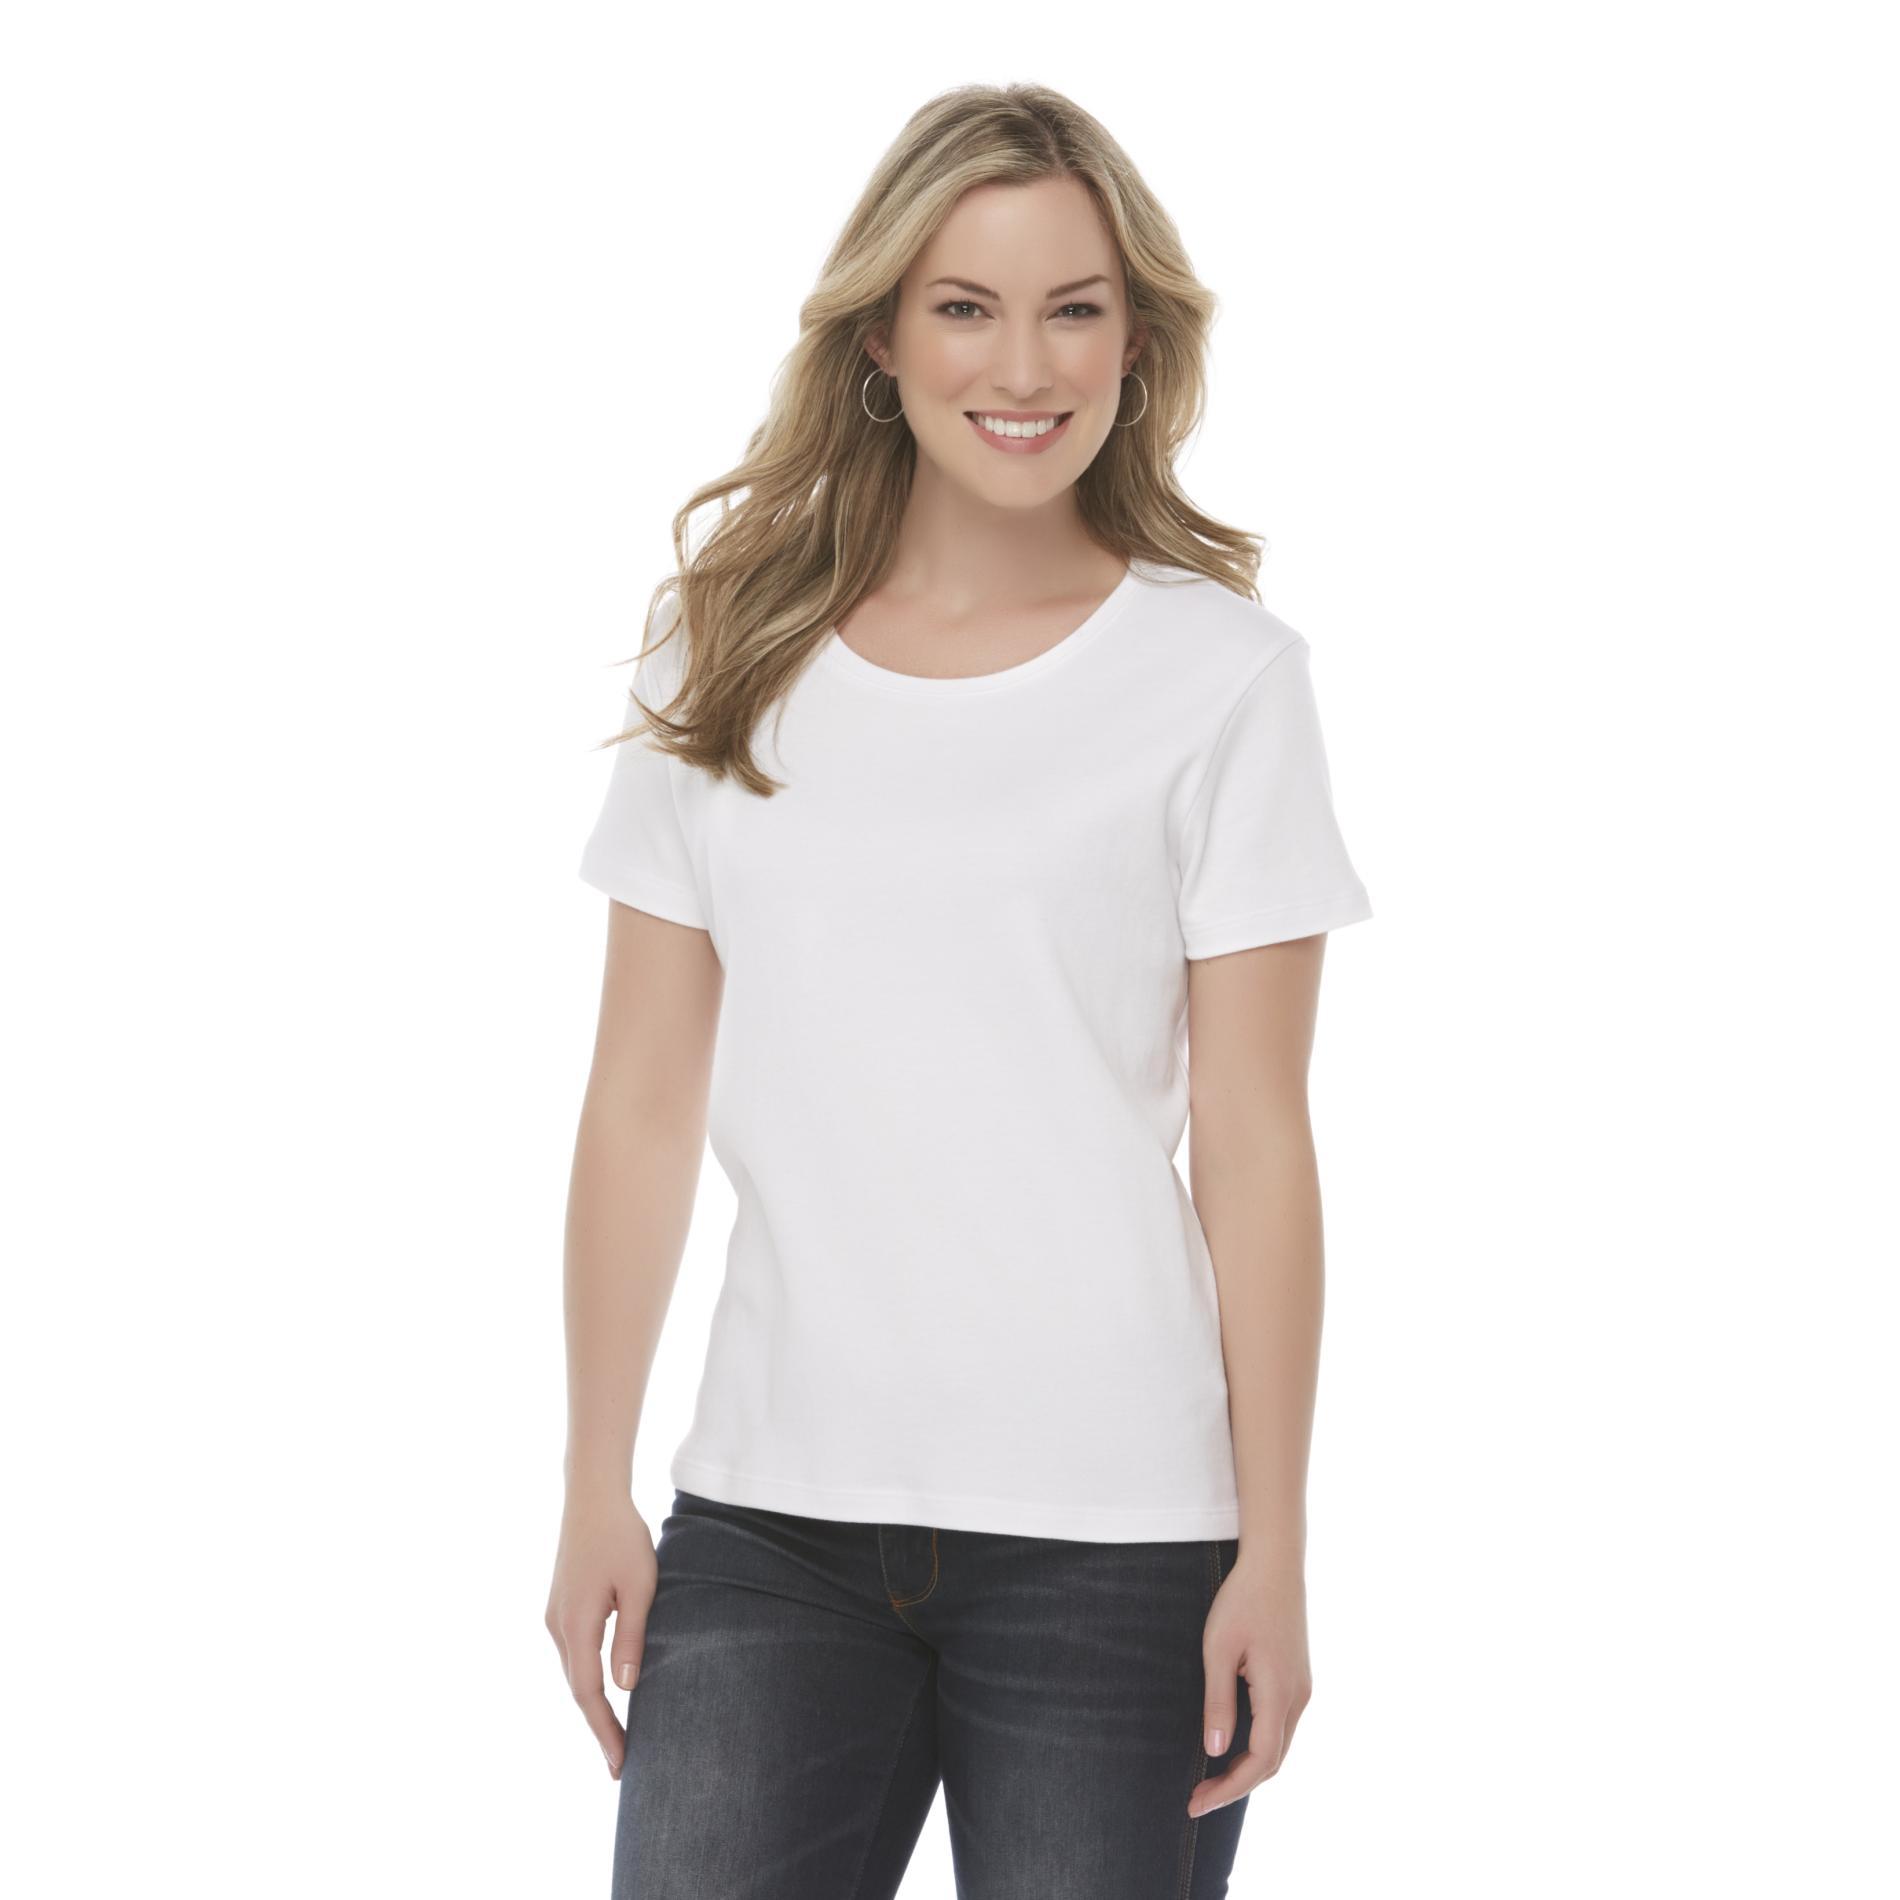 Laura Scott Petite's Short-Sleeve T-Shirt